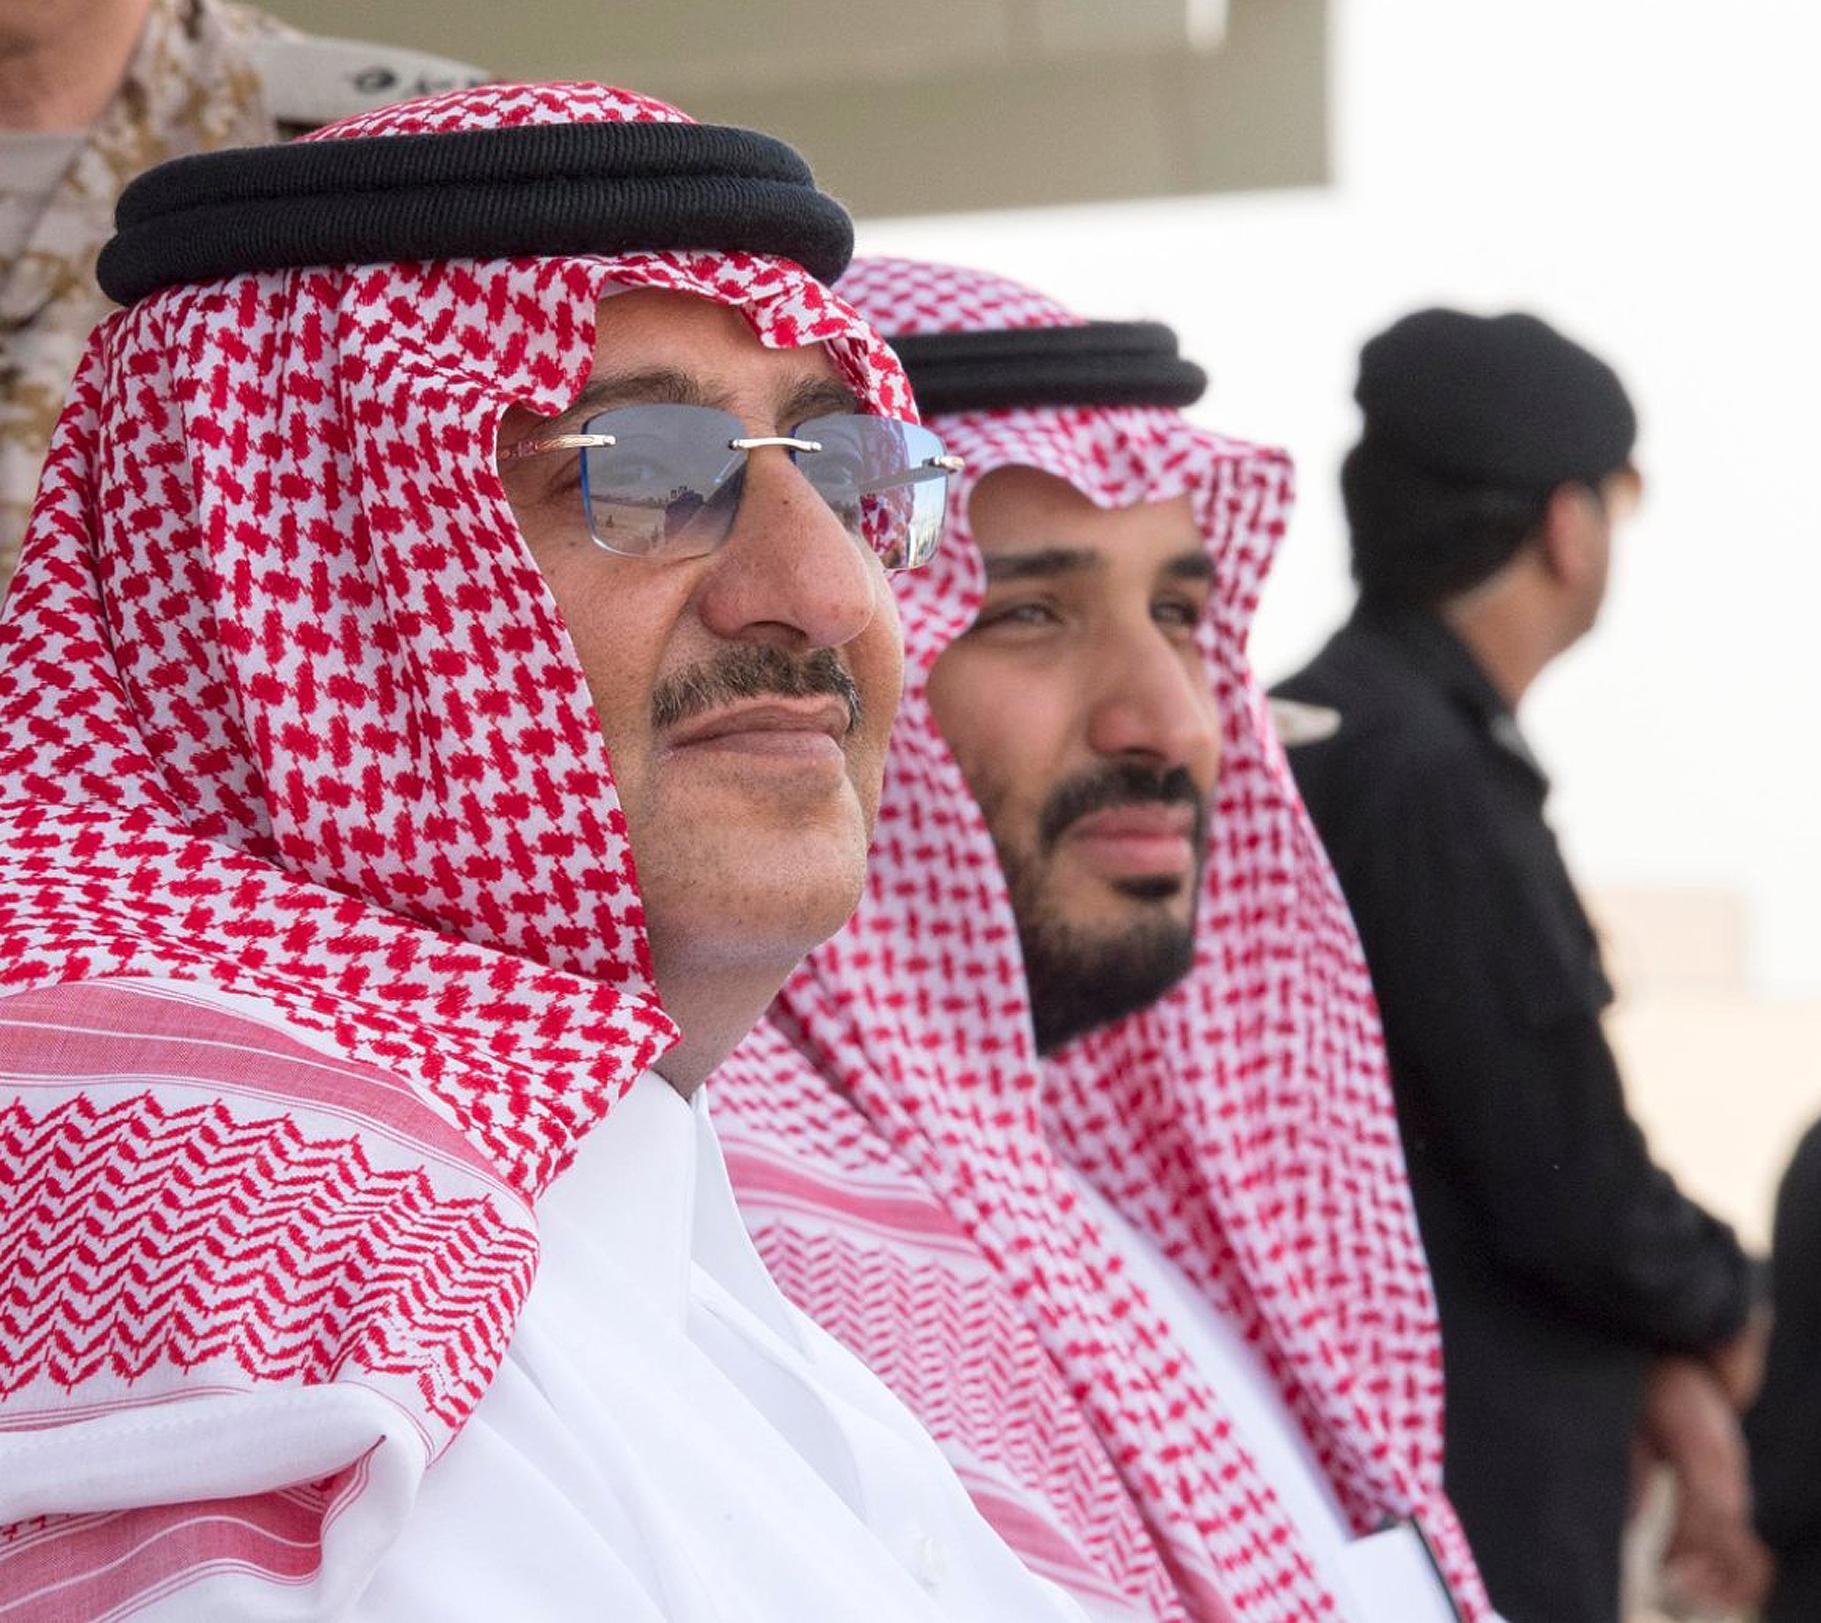 The case of Saudi Arabia's Mohammed bin Nayef